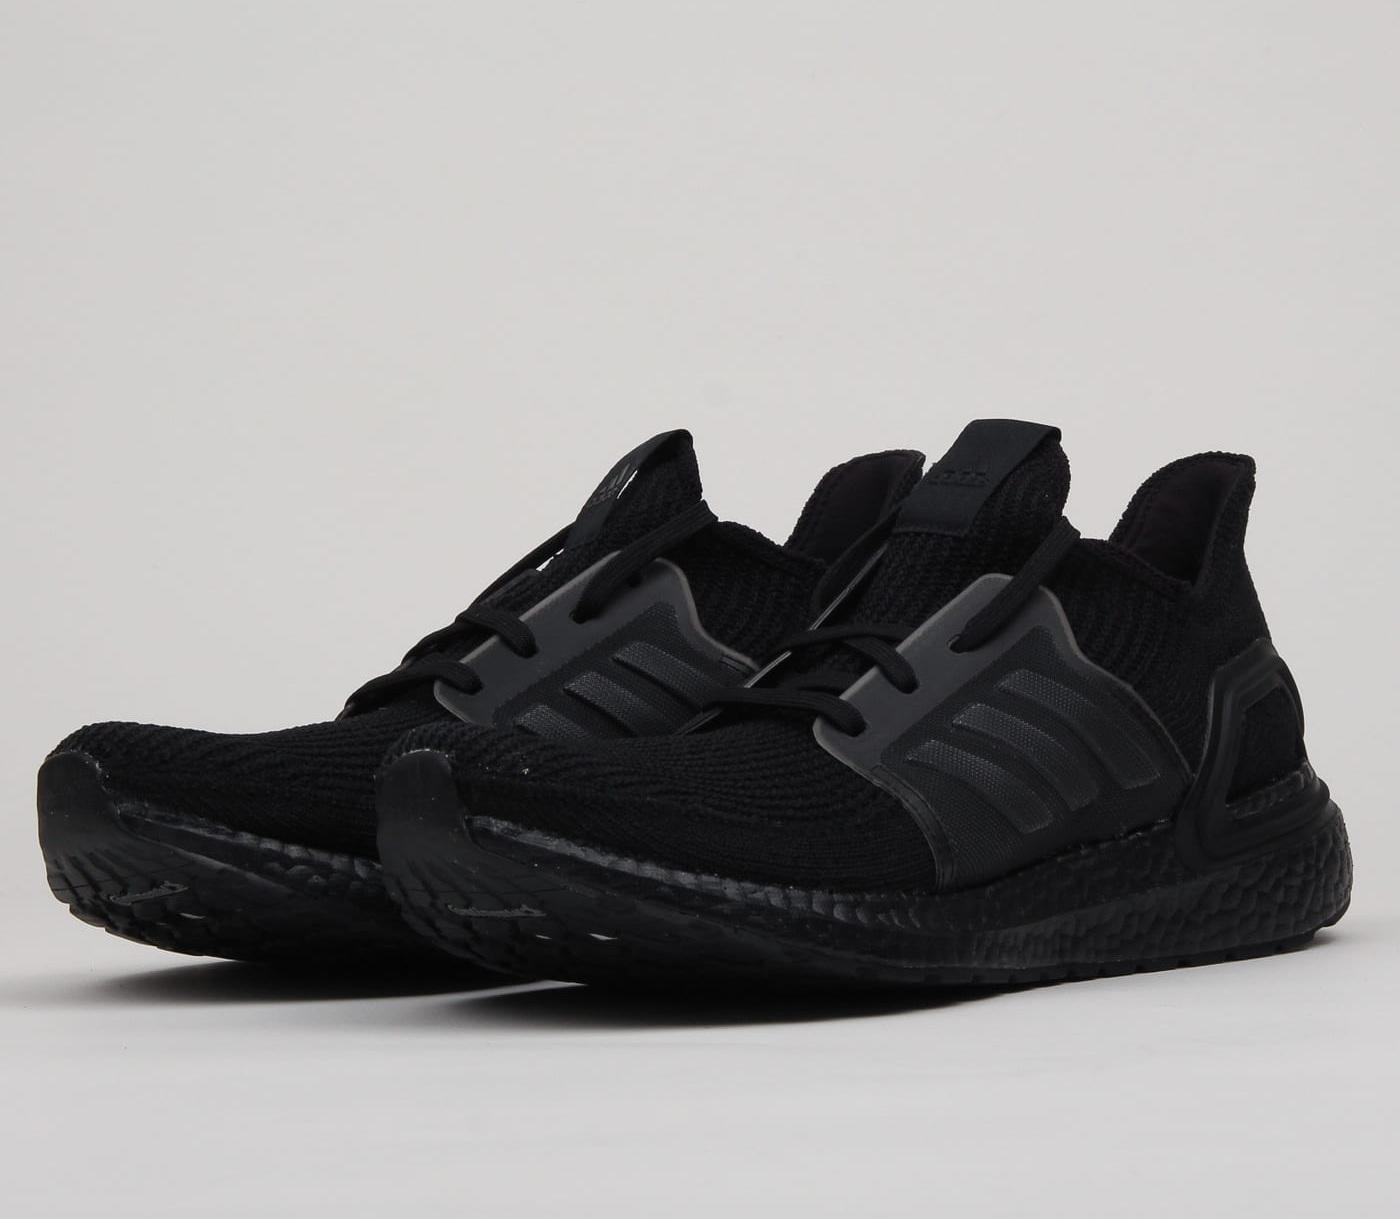 adidas-ultraboost-19-m-93097_1.jpg